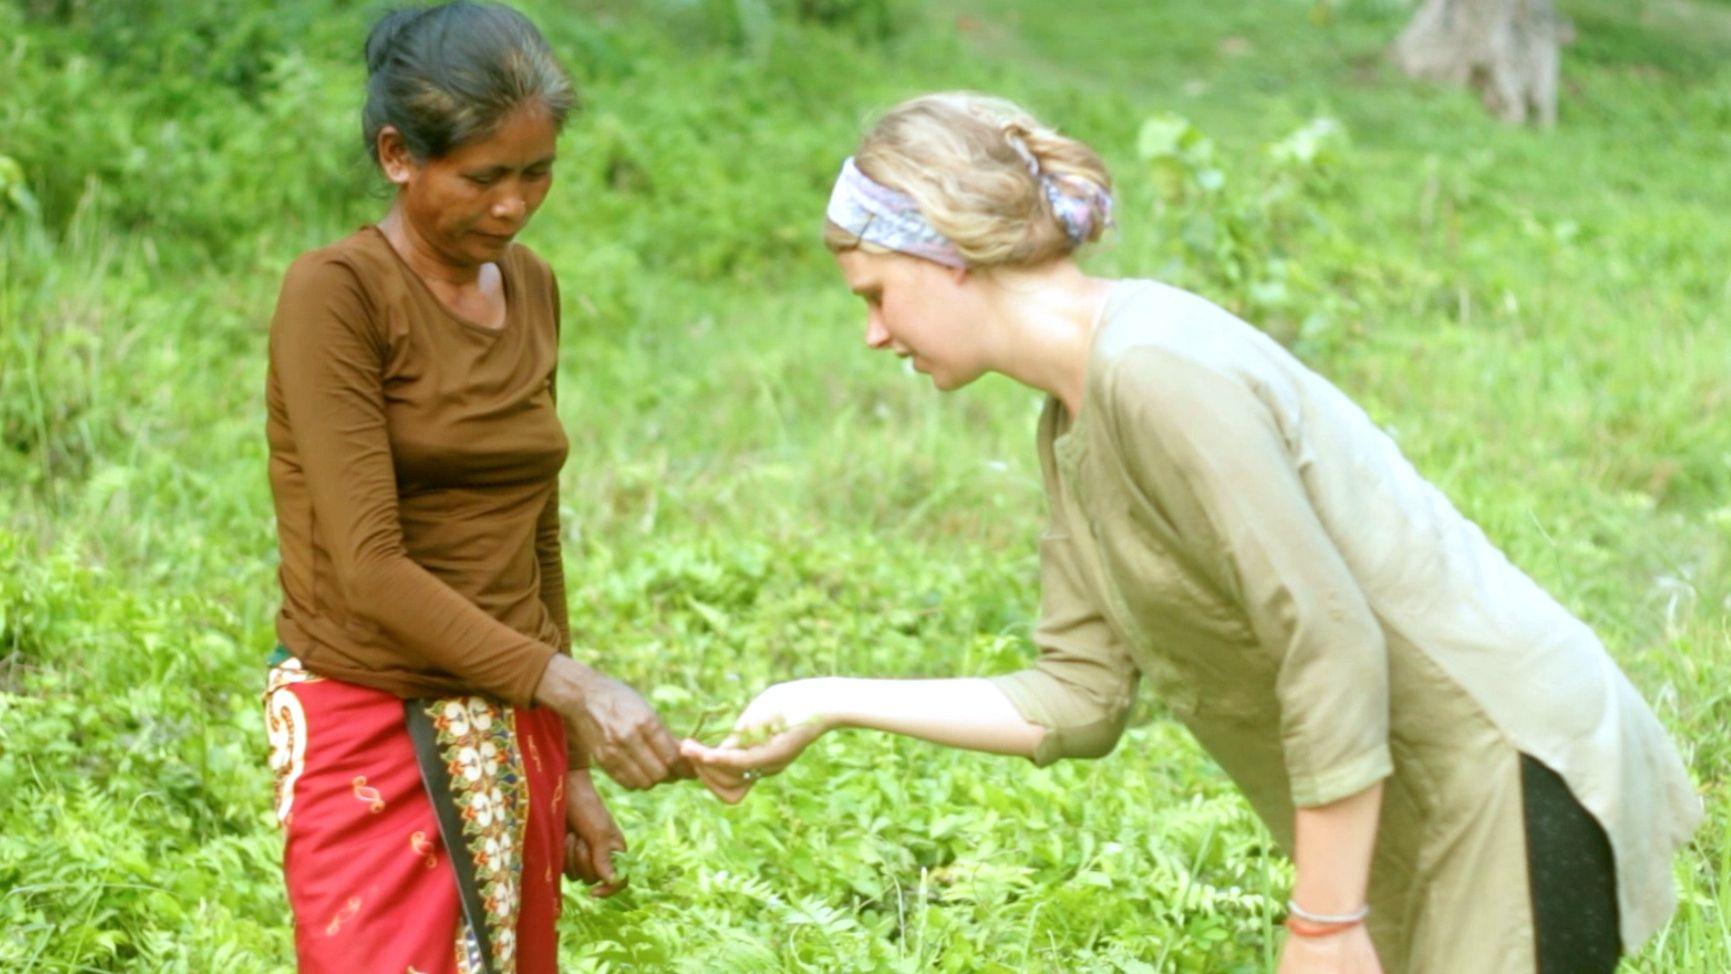 Oxleay.com (CC) Dream • Dhurba's Sapana Village • Chitwan • NEPAL-12. Video @ youtu.be/fvk9TxmTz3w